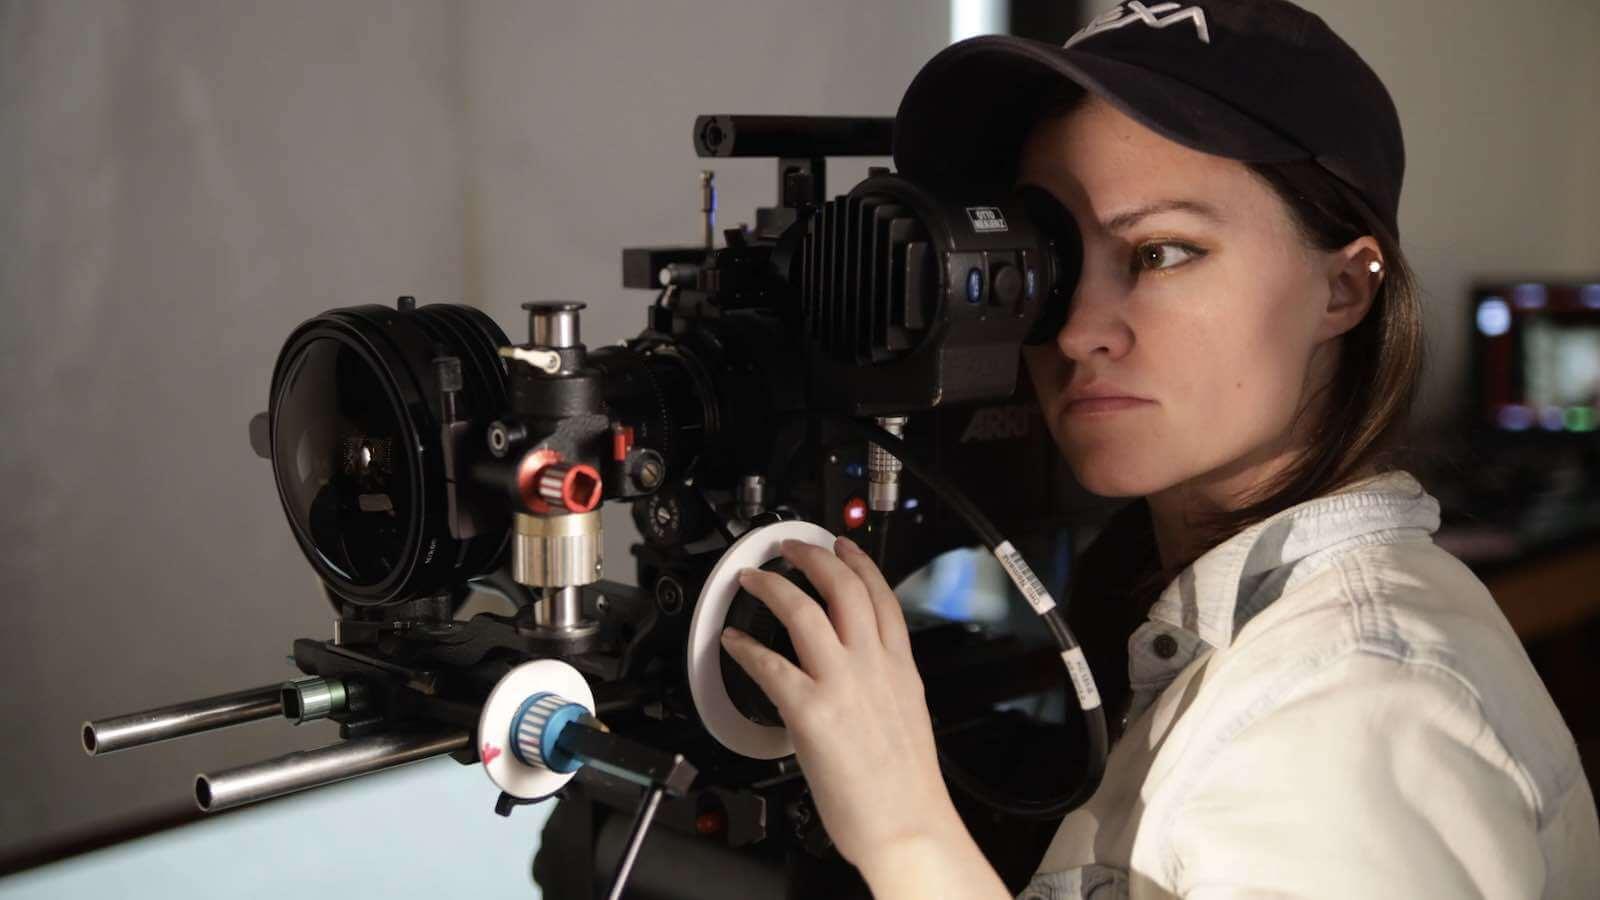 Deakinizer Lenses - Kaity Williams - StudioBinder